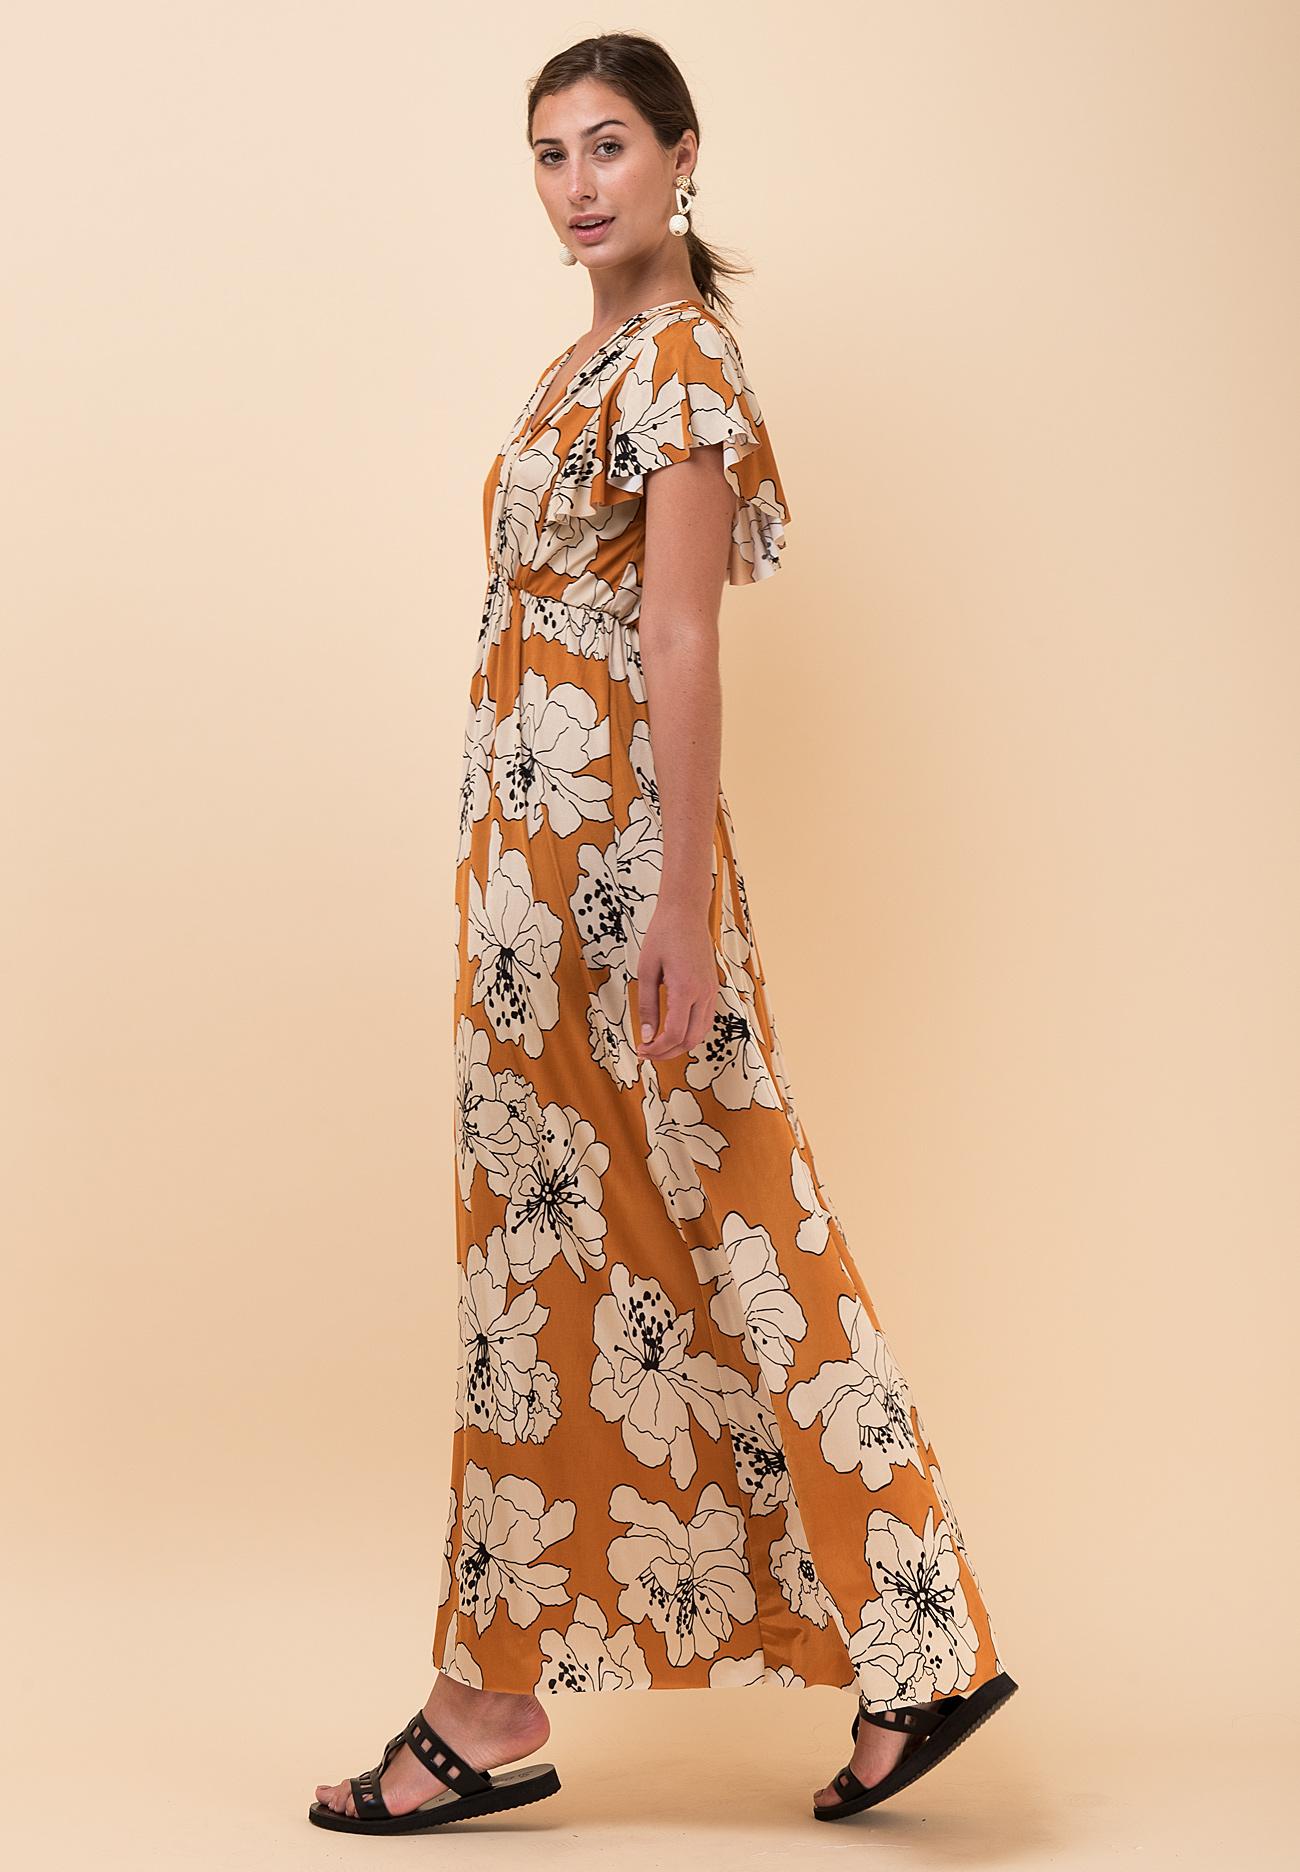 df5bb74c2b7 Εμπριμέ φόρεμα σε άνετη γραμμή - ZIC ZAC